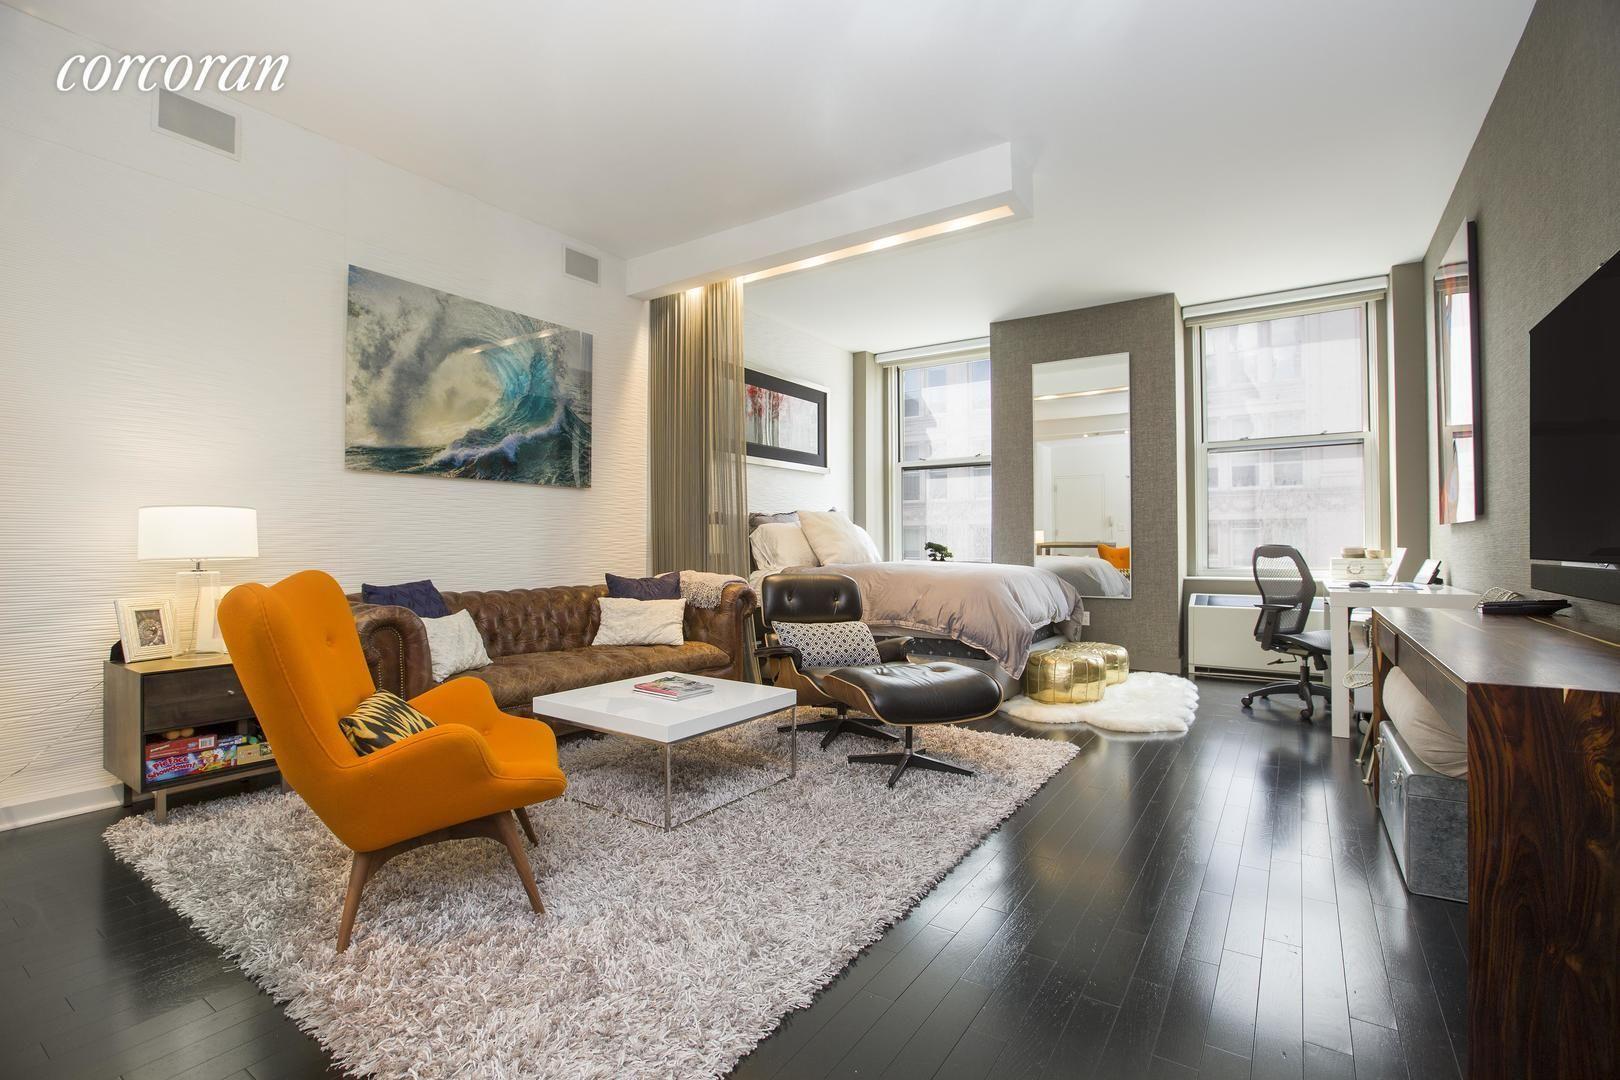 Apartment for sale at 650 Sixth Avenue, Apt 4C